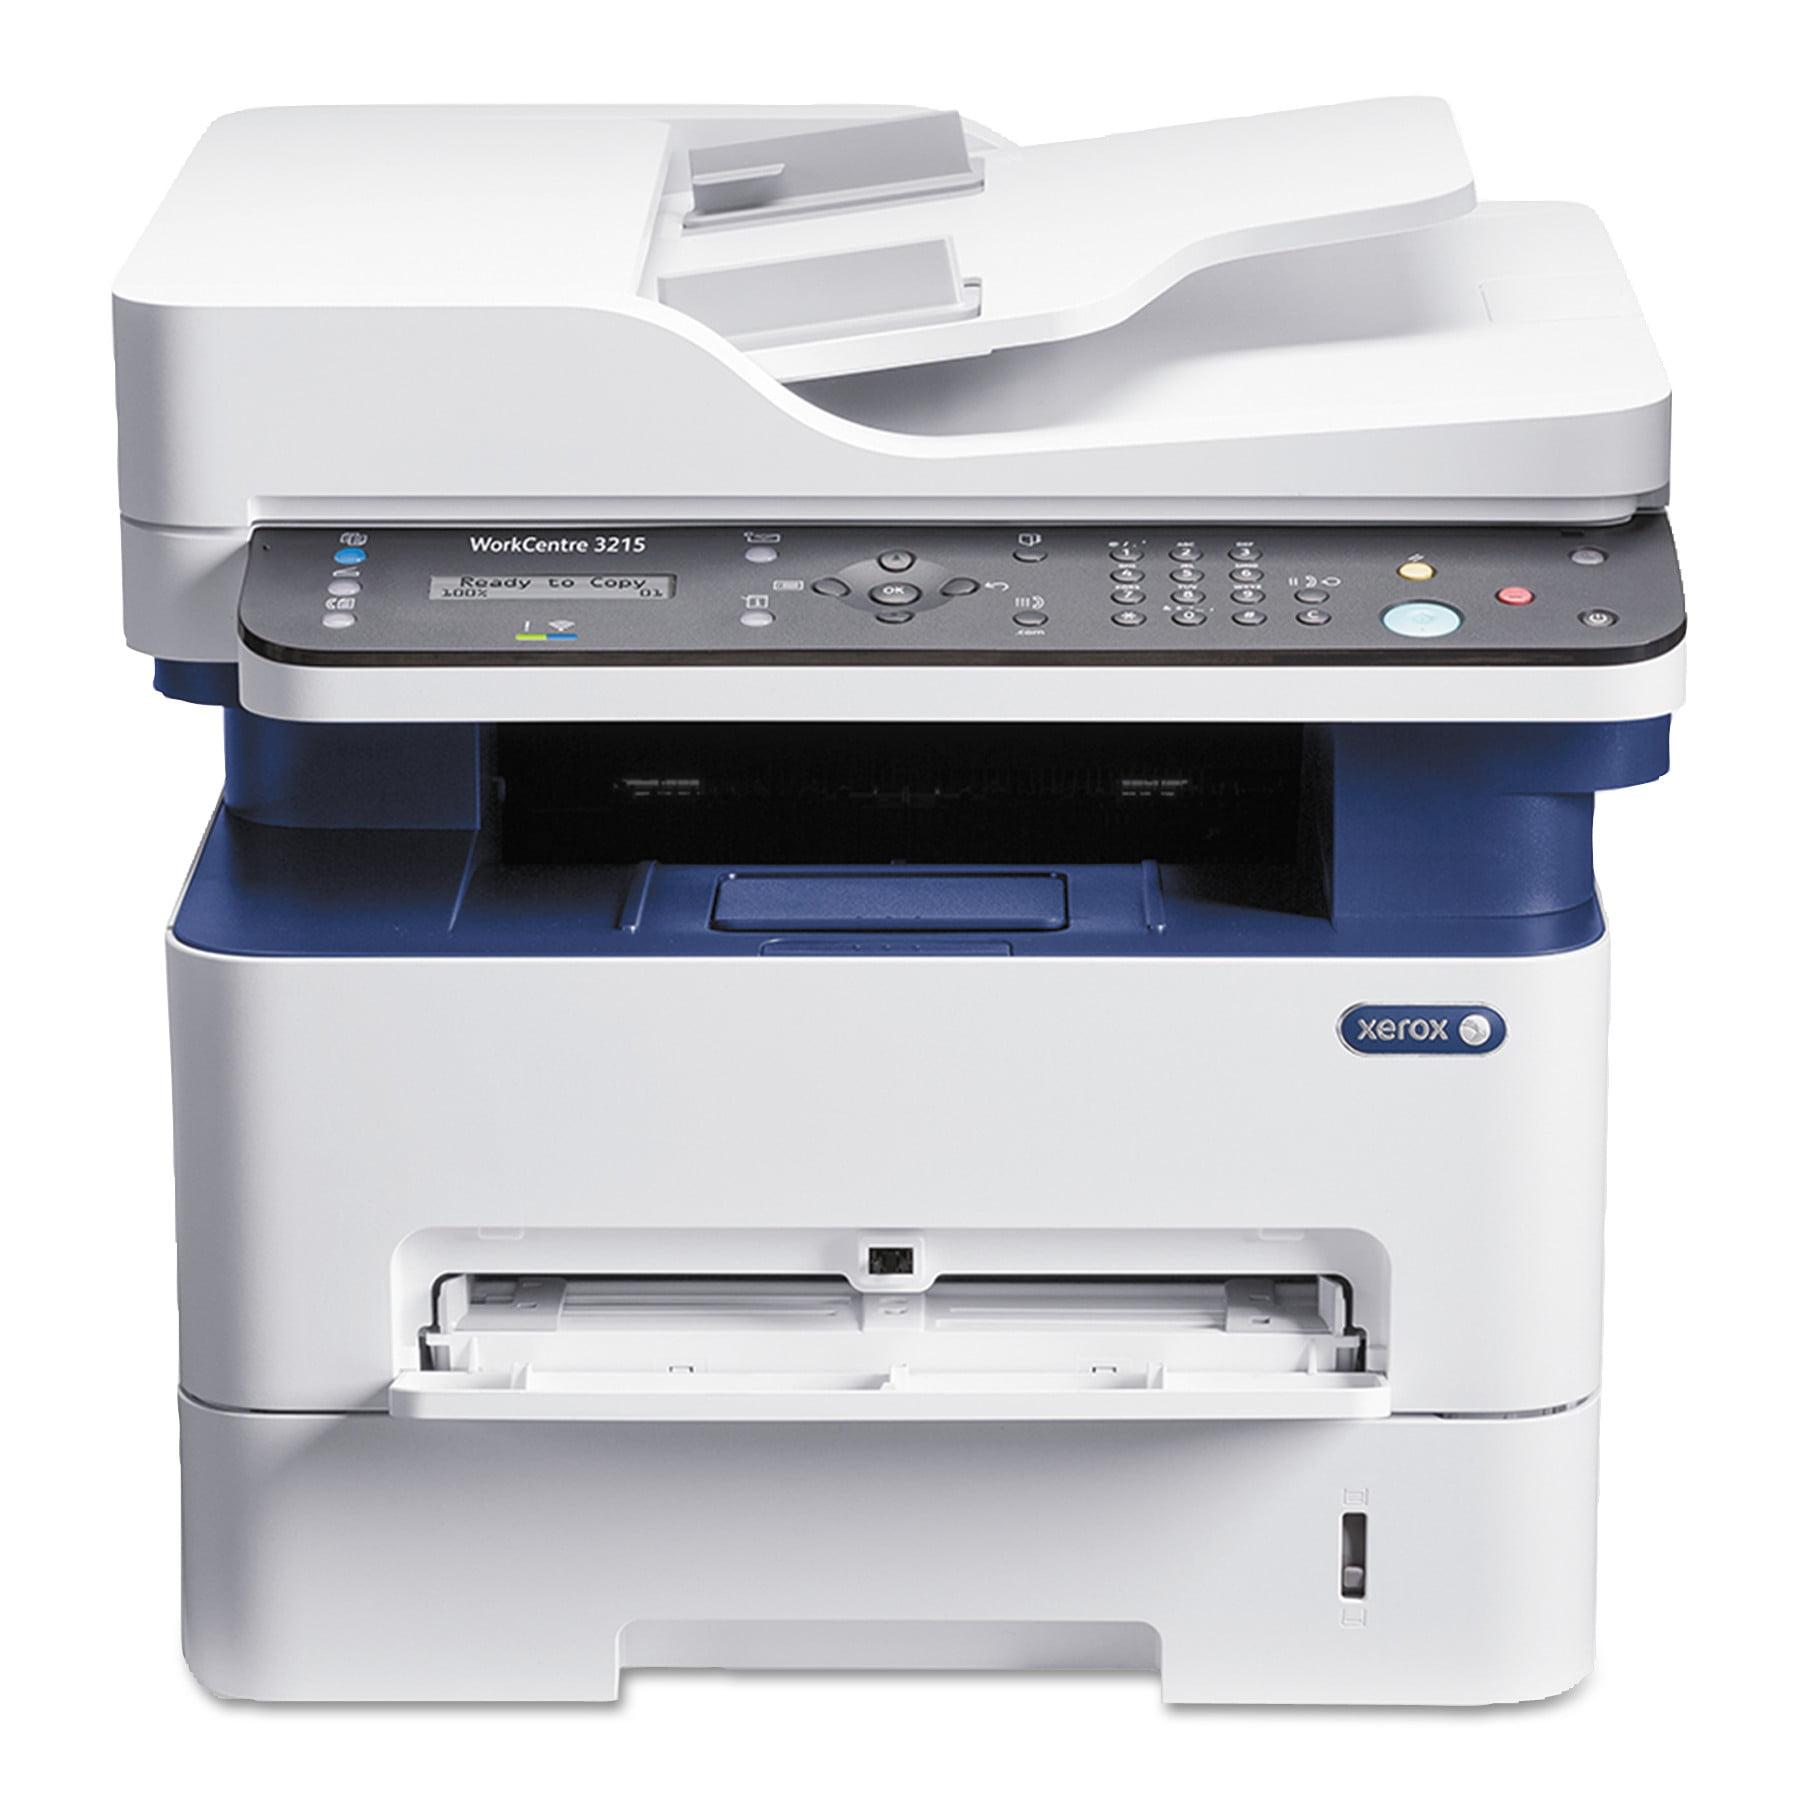 Xerox WorkCentre Laser Multifunction Printer - Monochrome - Plain Paper Print - Desktop - Multi